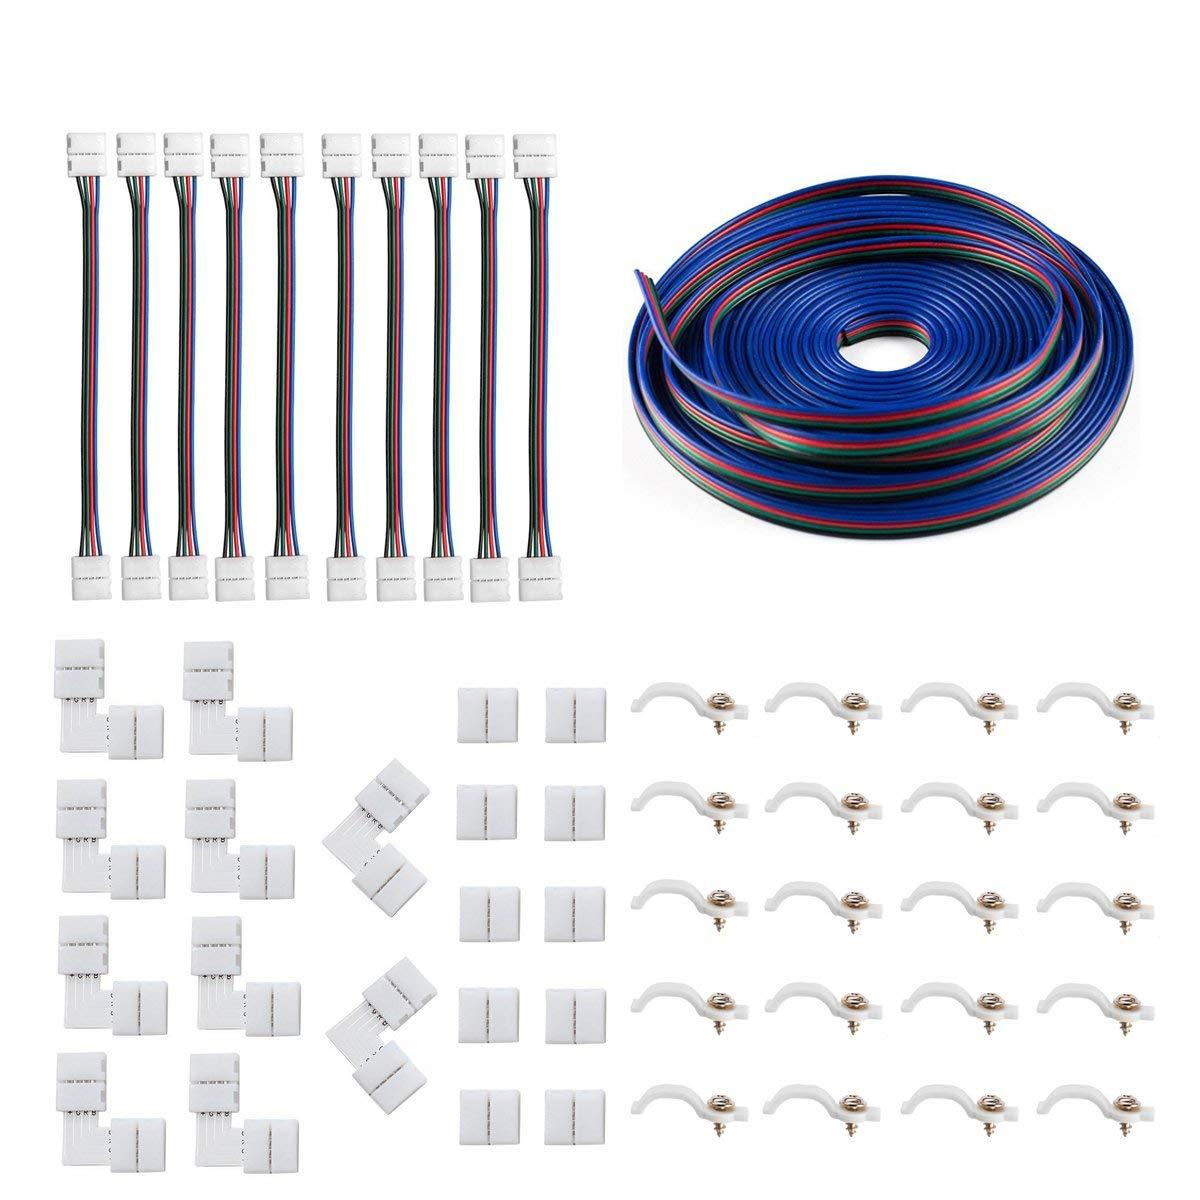 5050 4Pin LED Strip Connector Kit - 10mm RGB LED Connector Kit includes 32.8FT RGB Extension Cable, 10x LED Strip Jumper, 10x L Shape Connectors, 10x Gapless Connectors, 20x LED Strip Clips